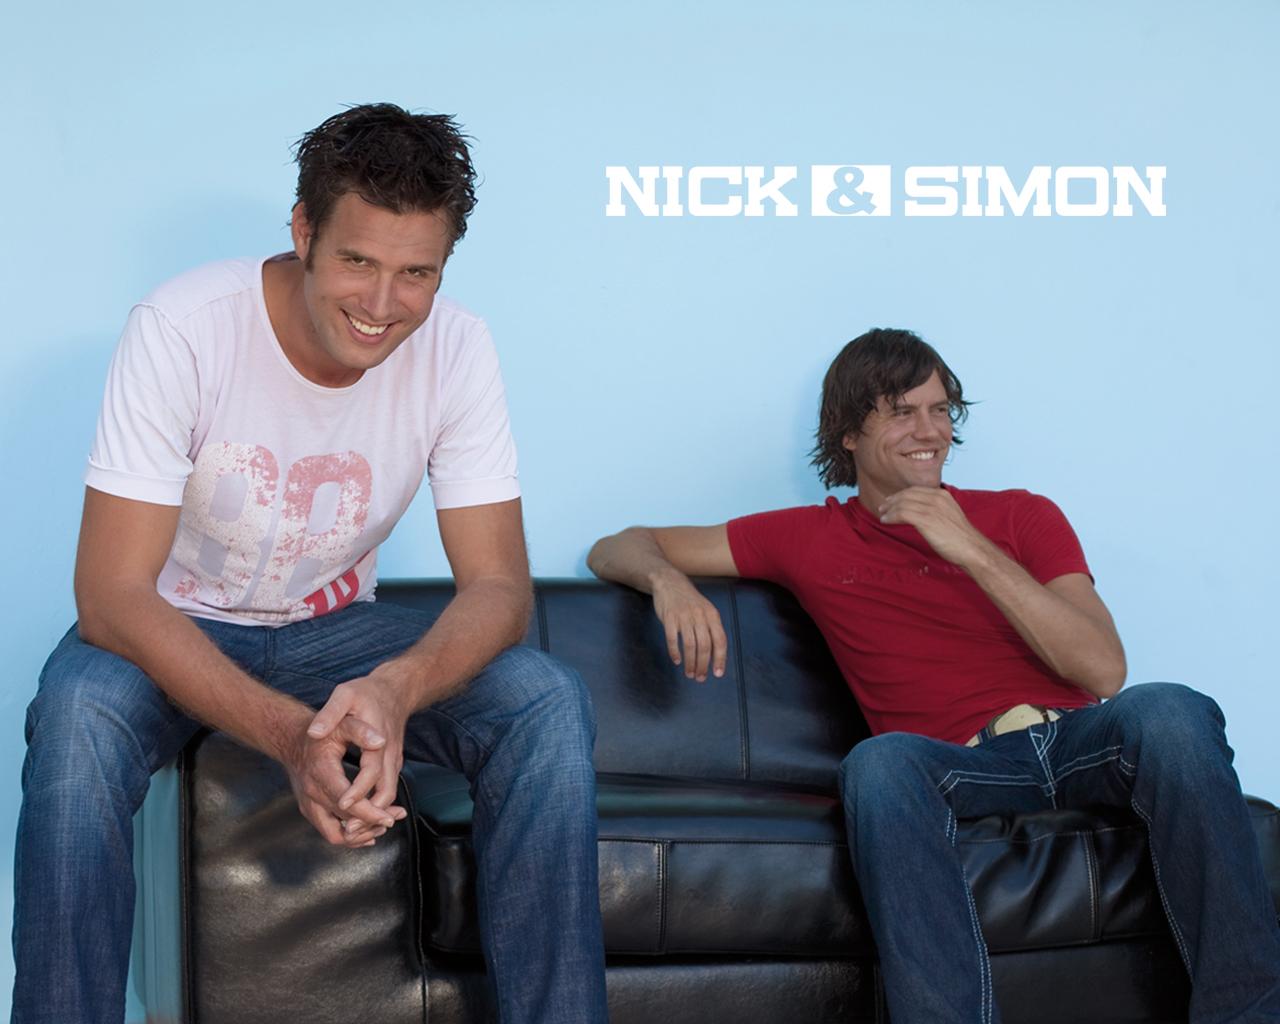 http://2.bp.blogspot.com/_oJpV6yalpOk/TQ_ZGfnsFTI/AAAAAAAABM0/7k97sepdh7M/s1600/Nick-en-simon-achtergronden-nick-en-simon-wallpapers-3.jpg